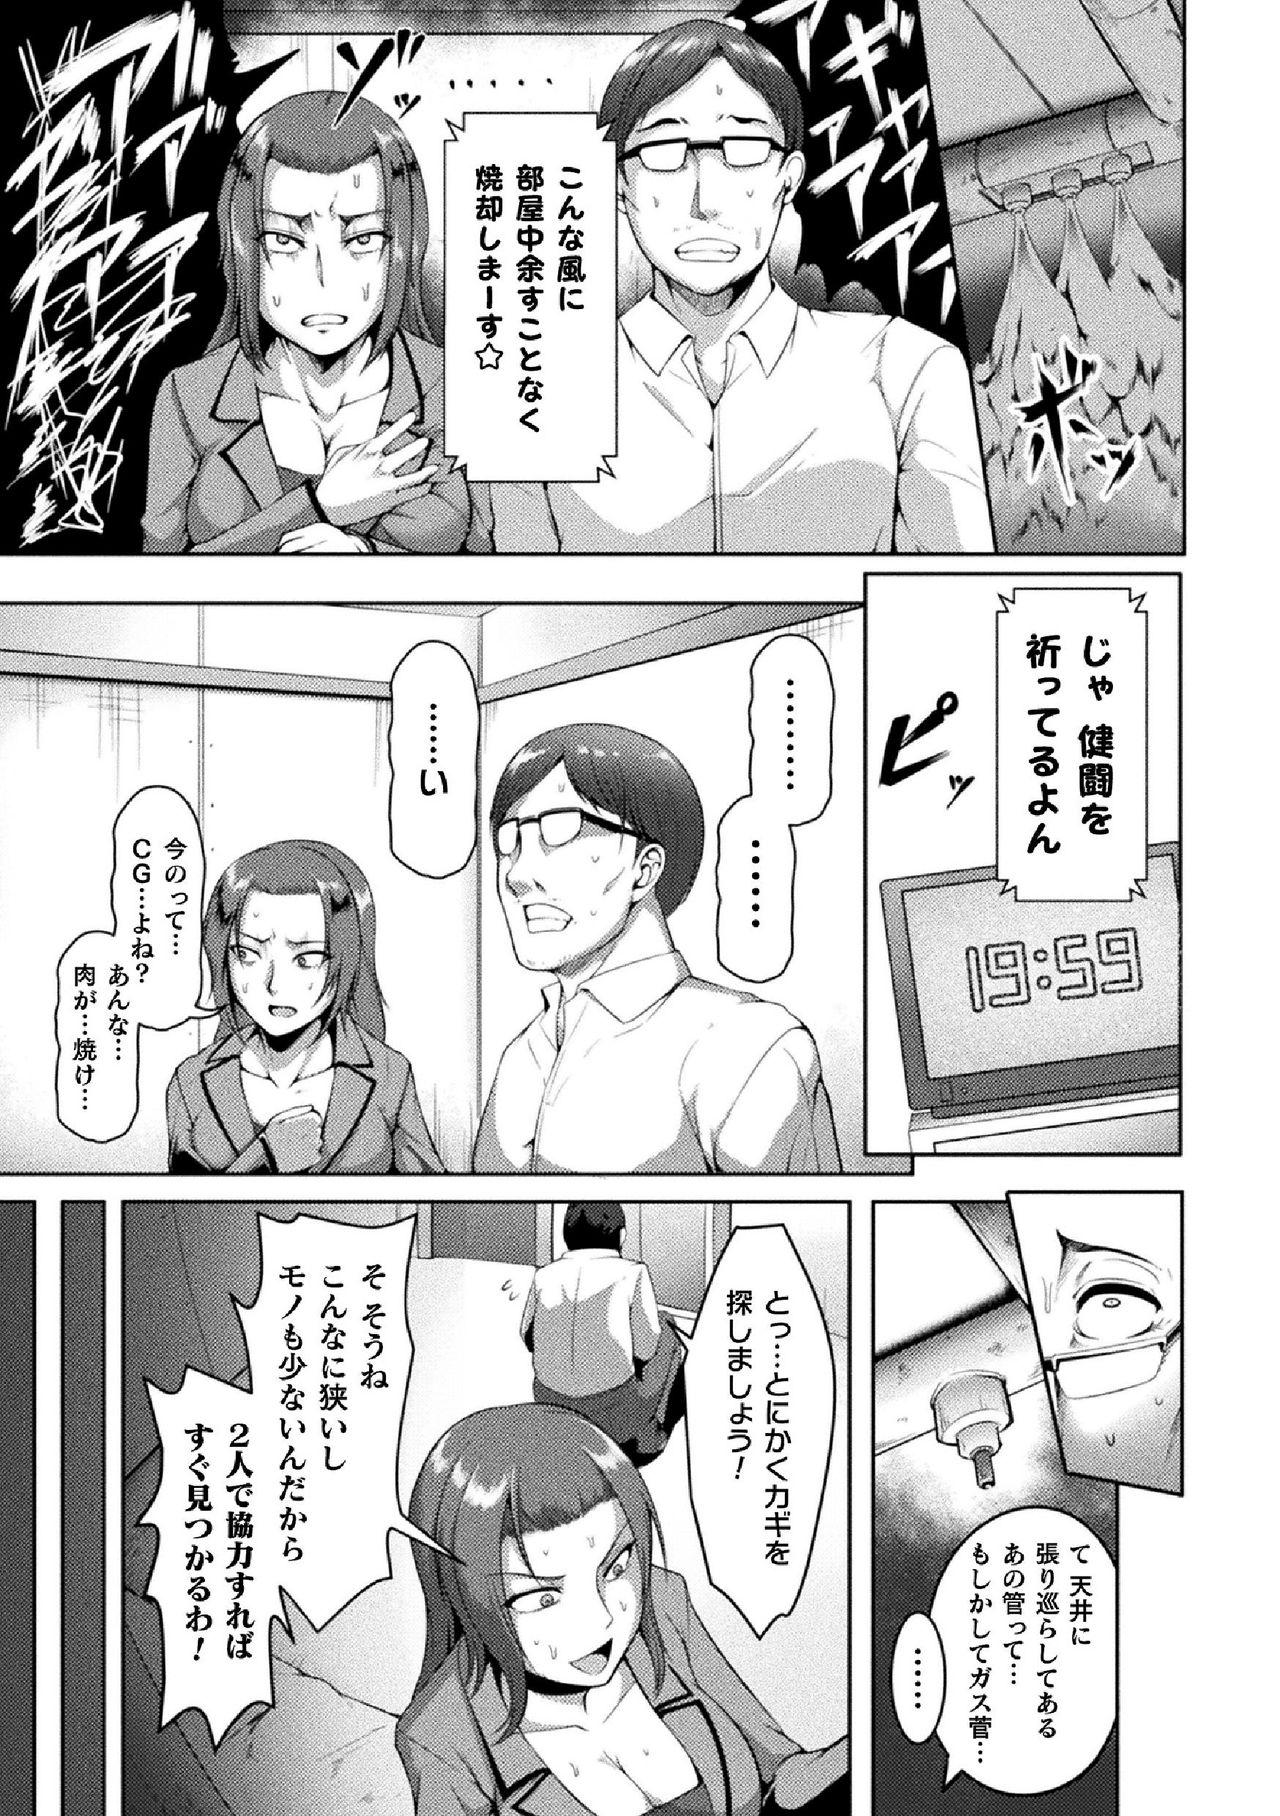 2D Comic Magazine Namaiki Onna ni HaraPun Seisai! Vol. 2 50